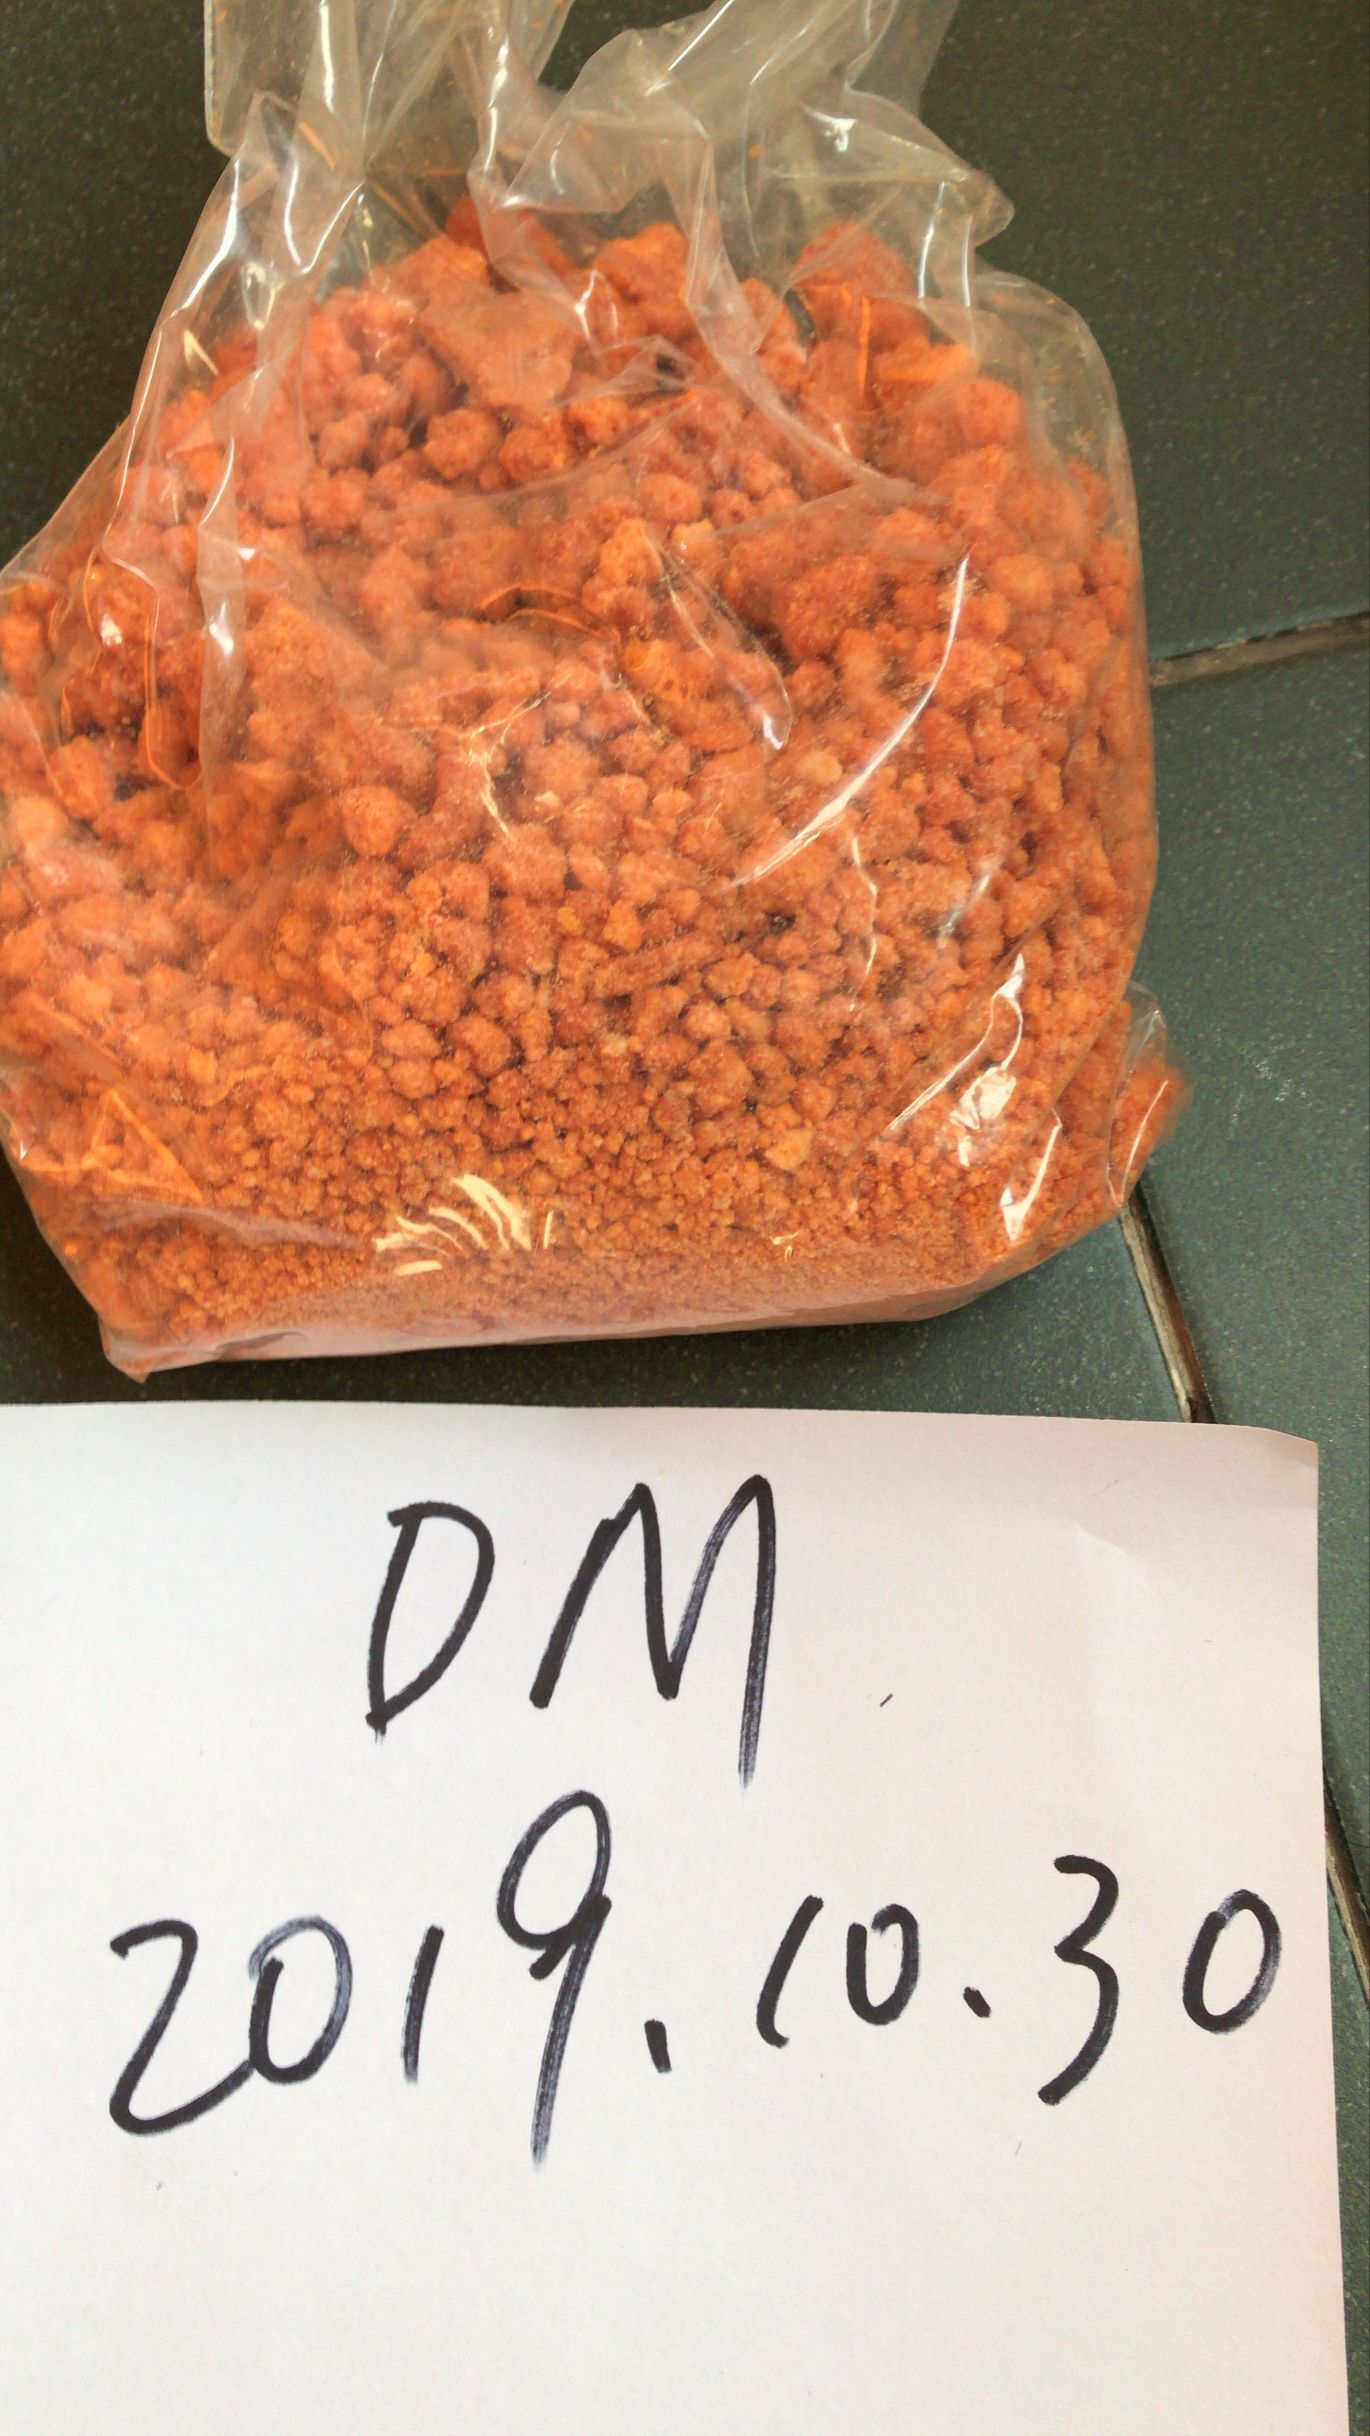 Strong cannabinoids powder 5f 5f-mdmb-2201 5fmdmb 2201 sellers sales02